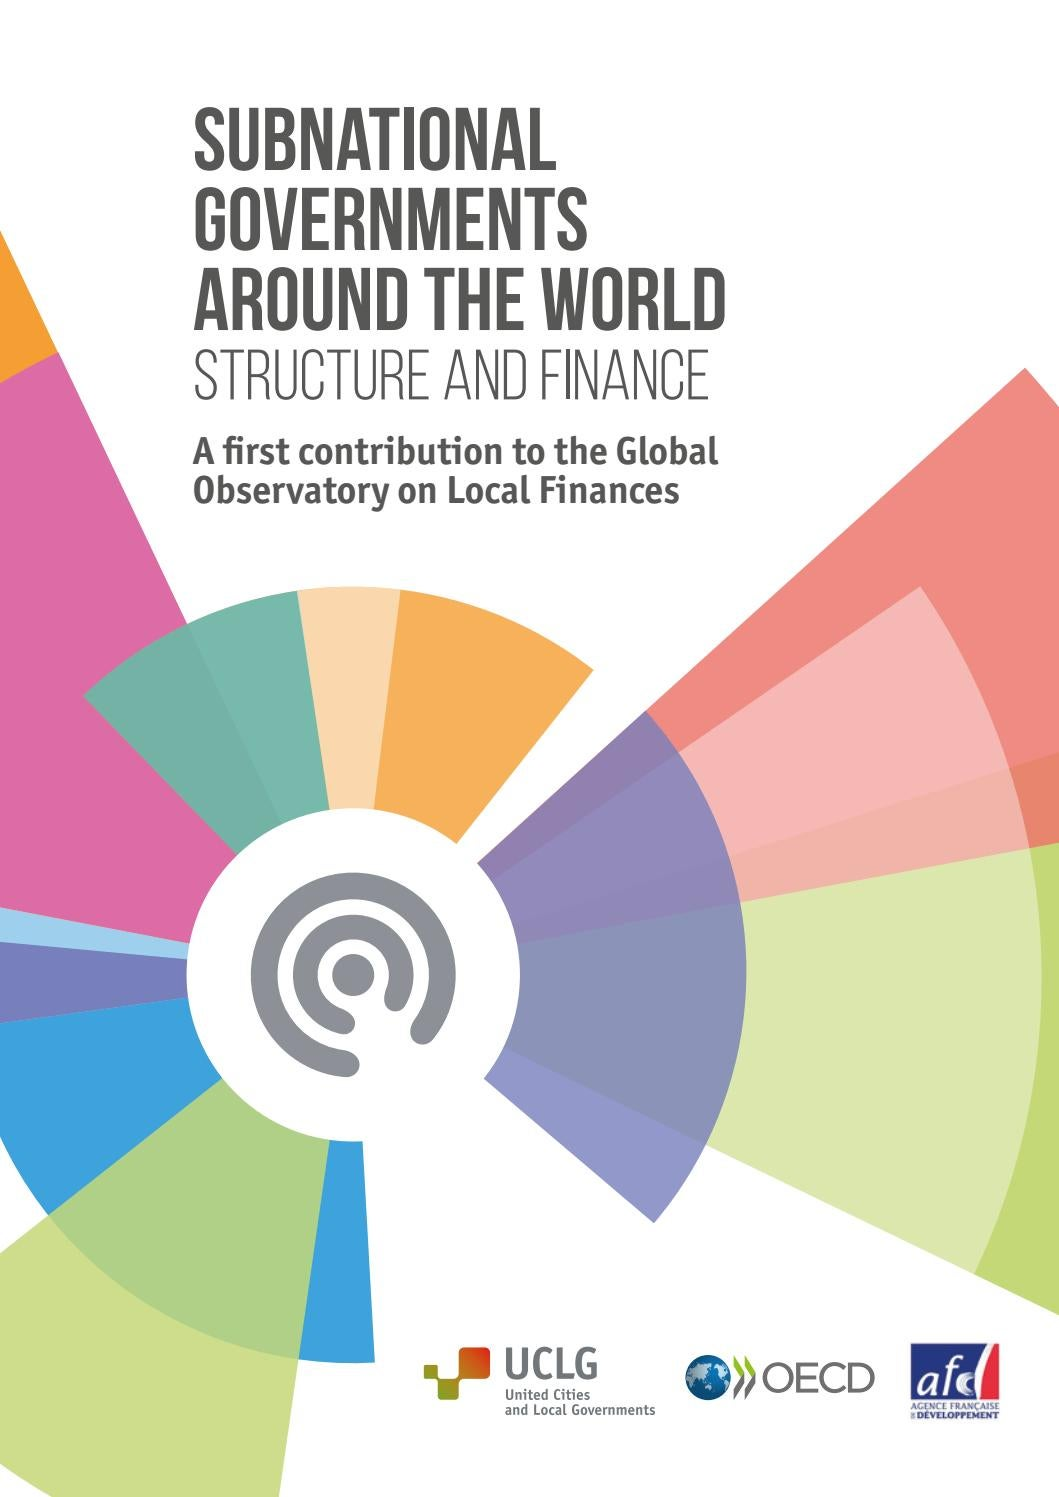 Global observatory on local finances by UCLG CGLU - issuu